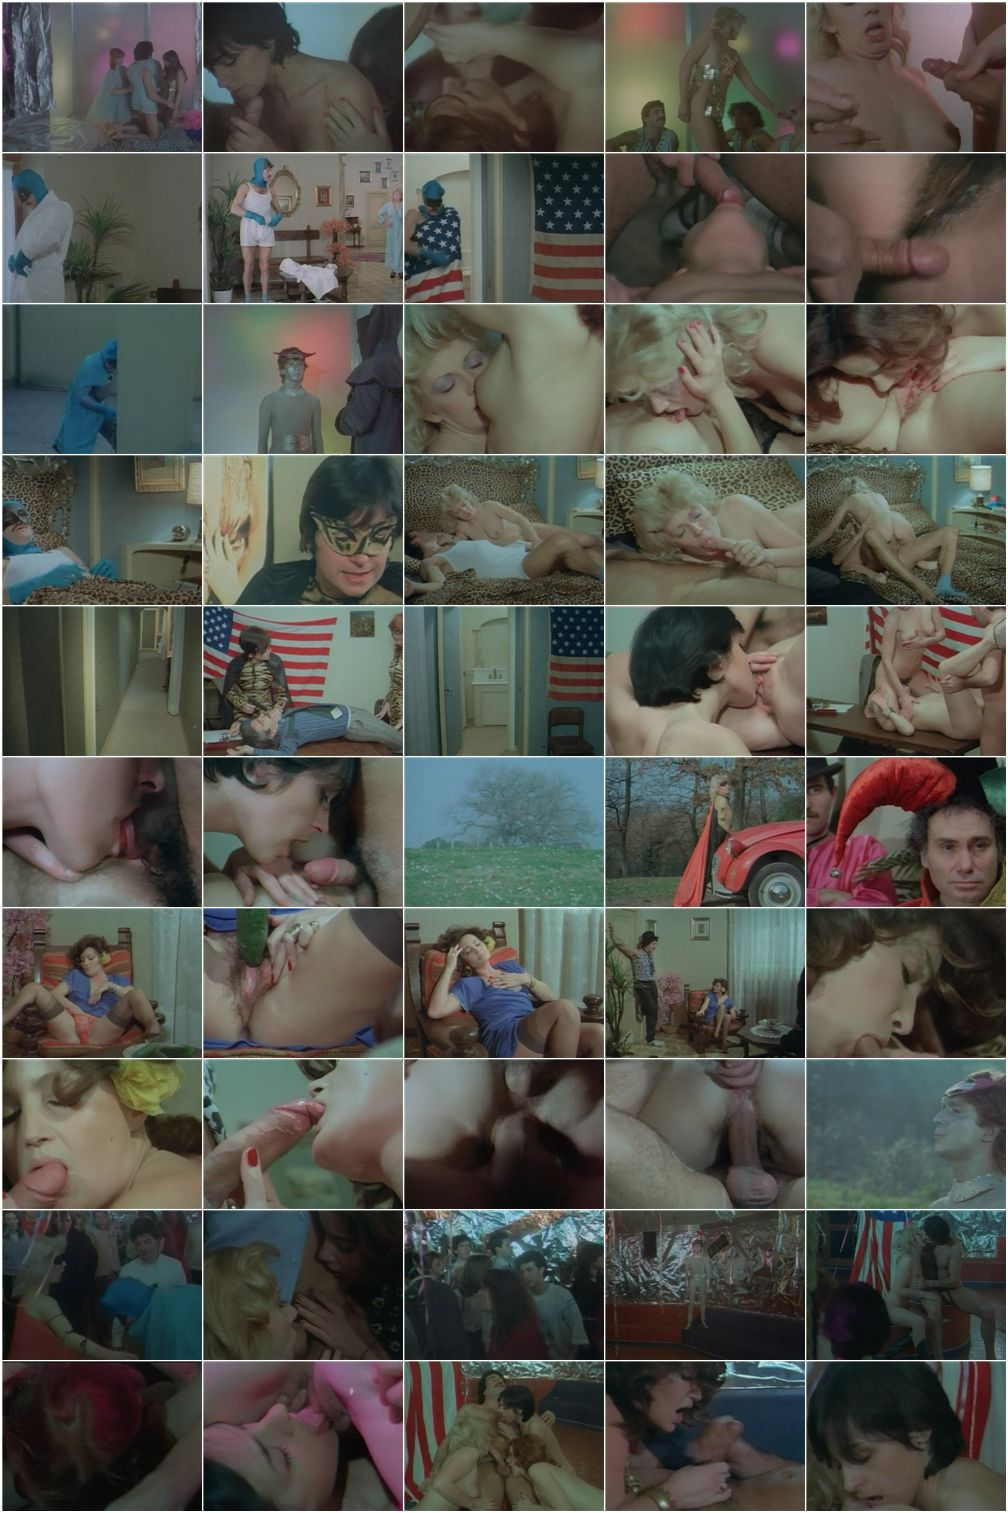 porno-film-plot